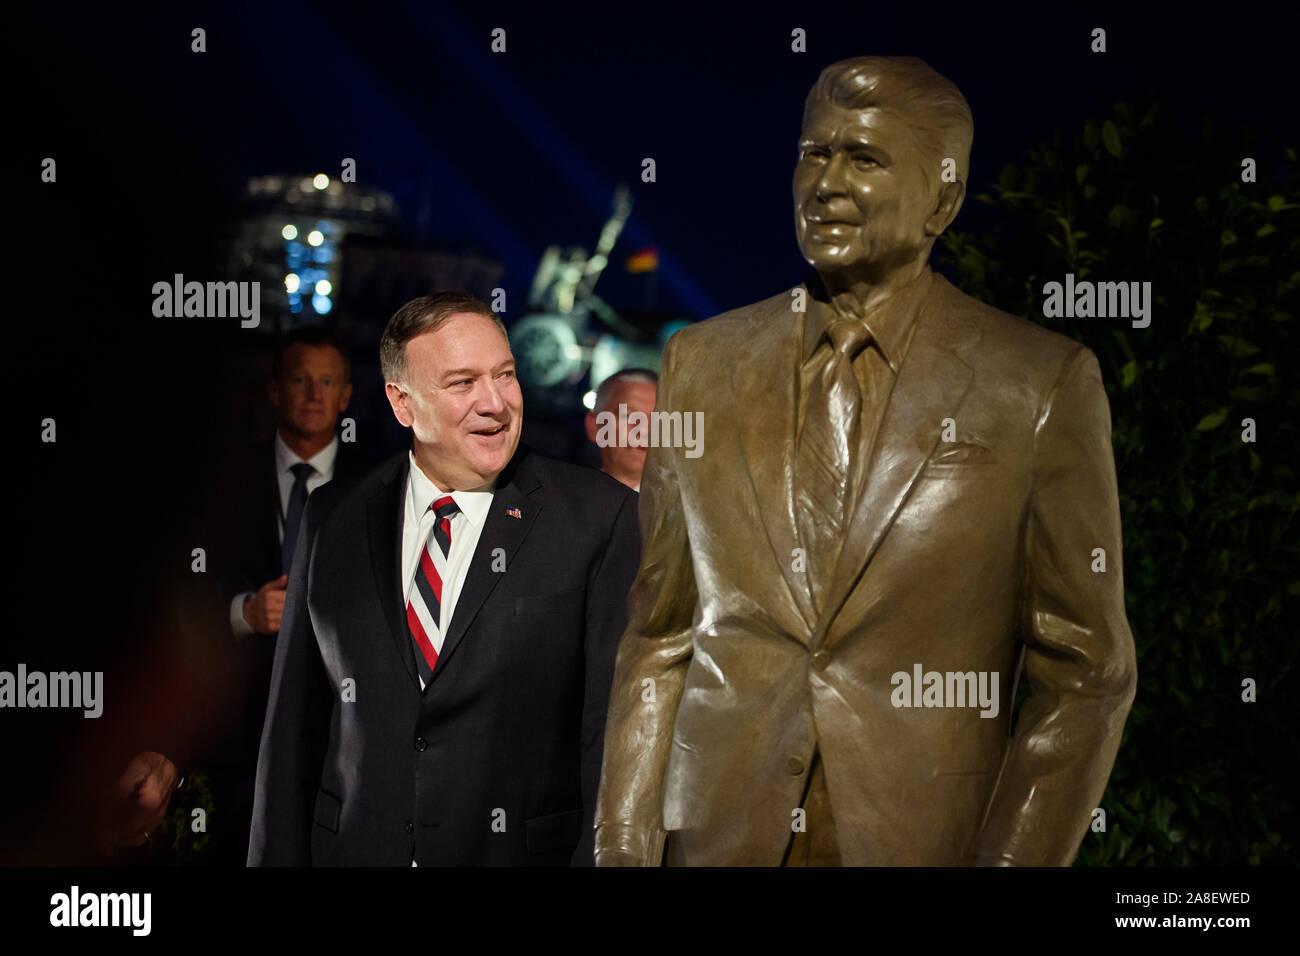 Ronald Wilson Reagan Marble Sculpture Bust America/'s 40th President Republican